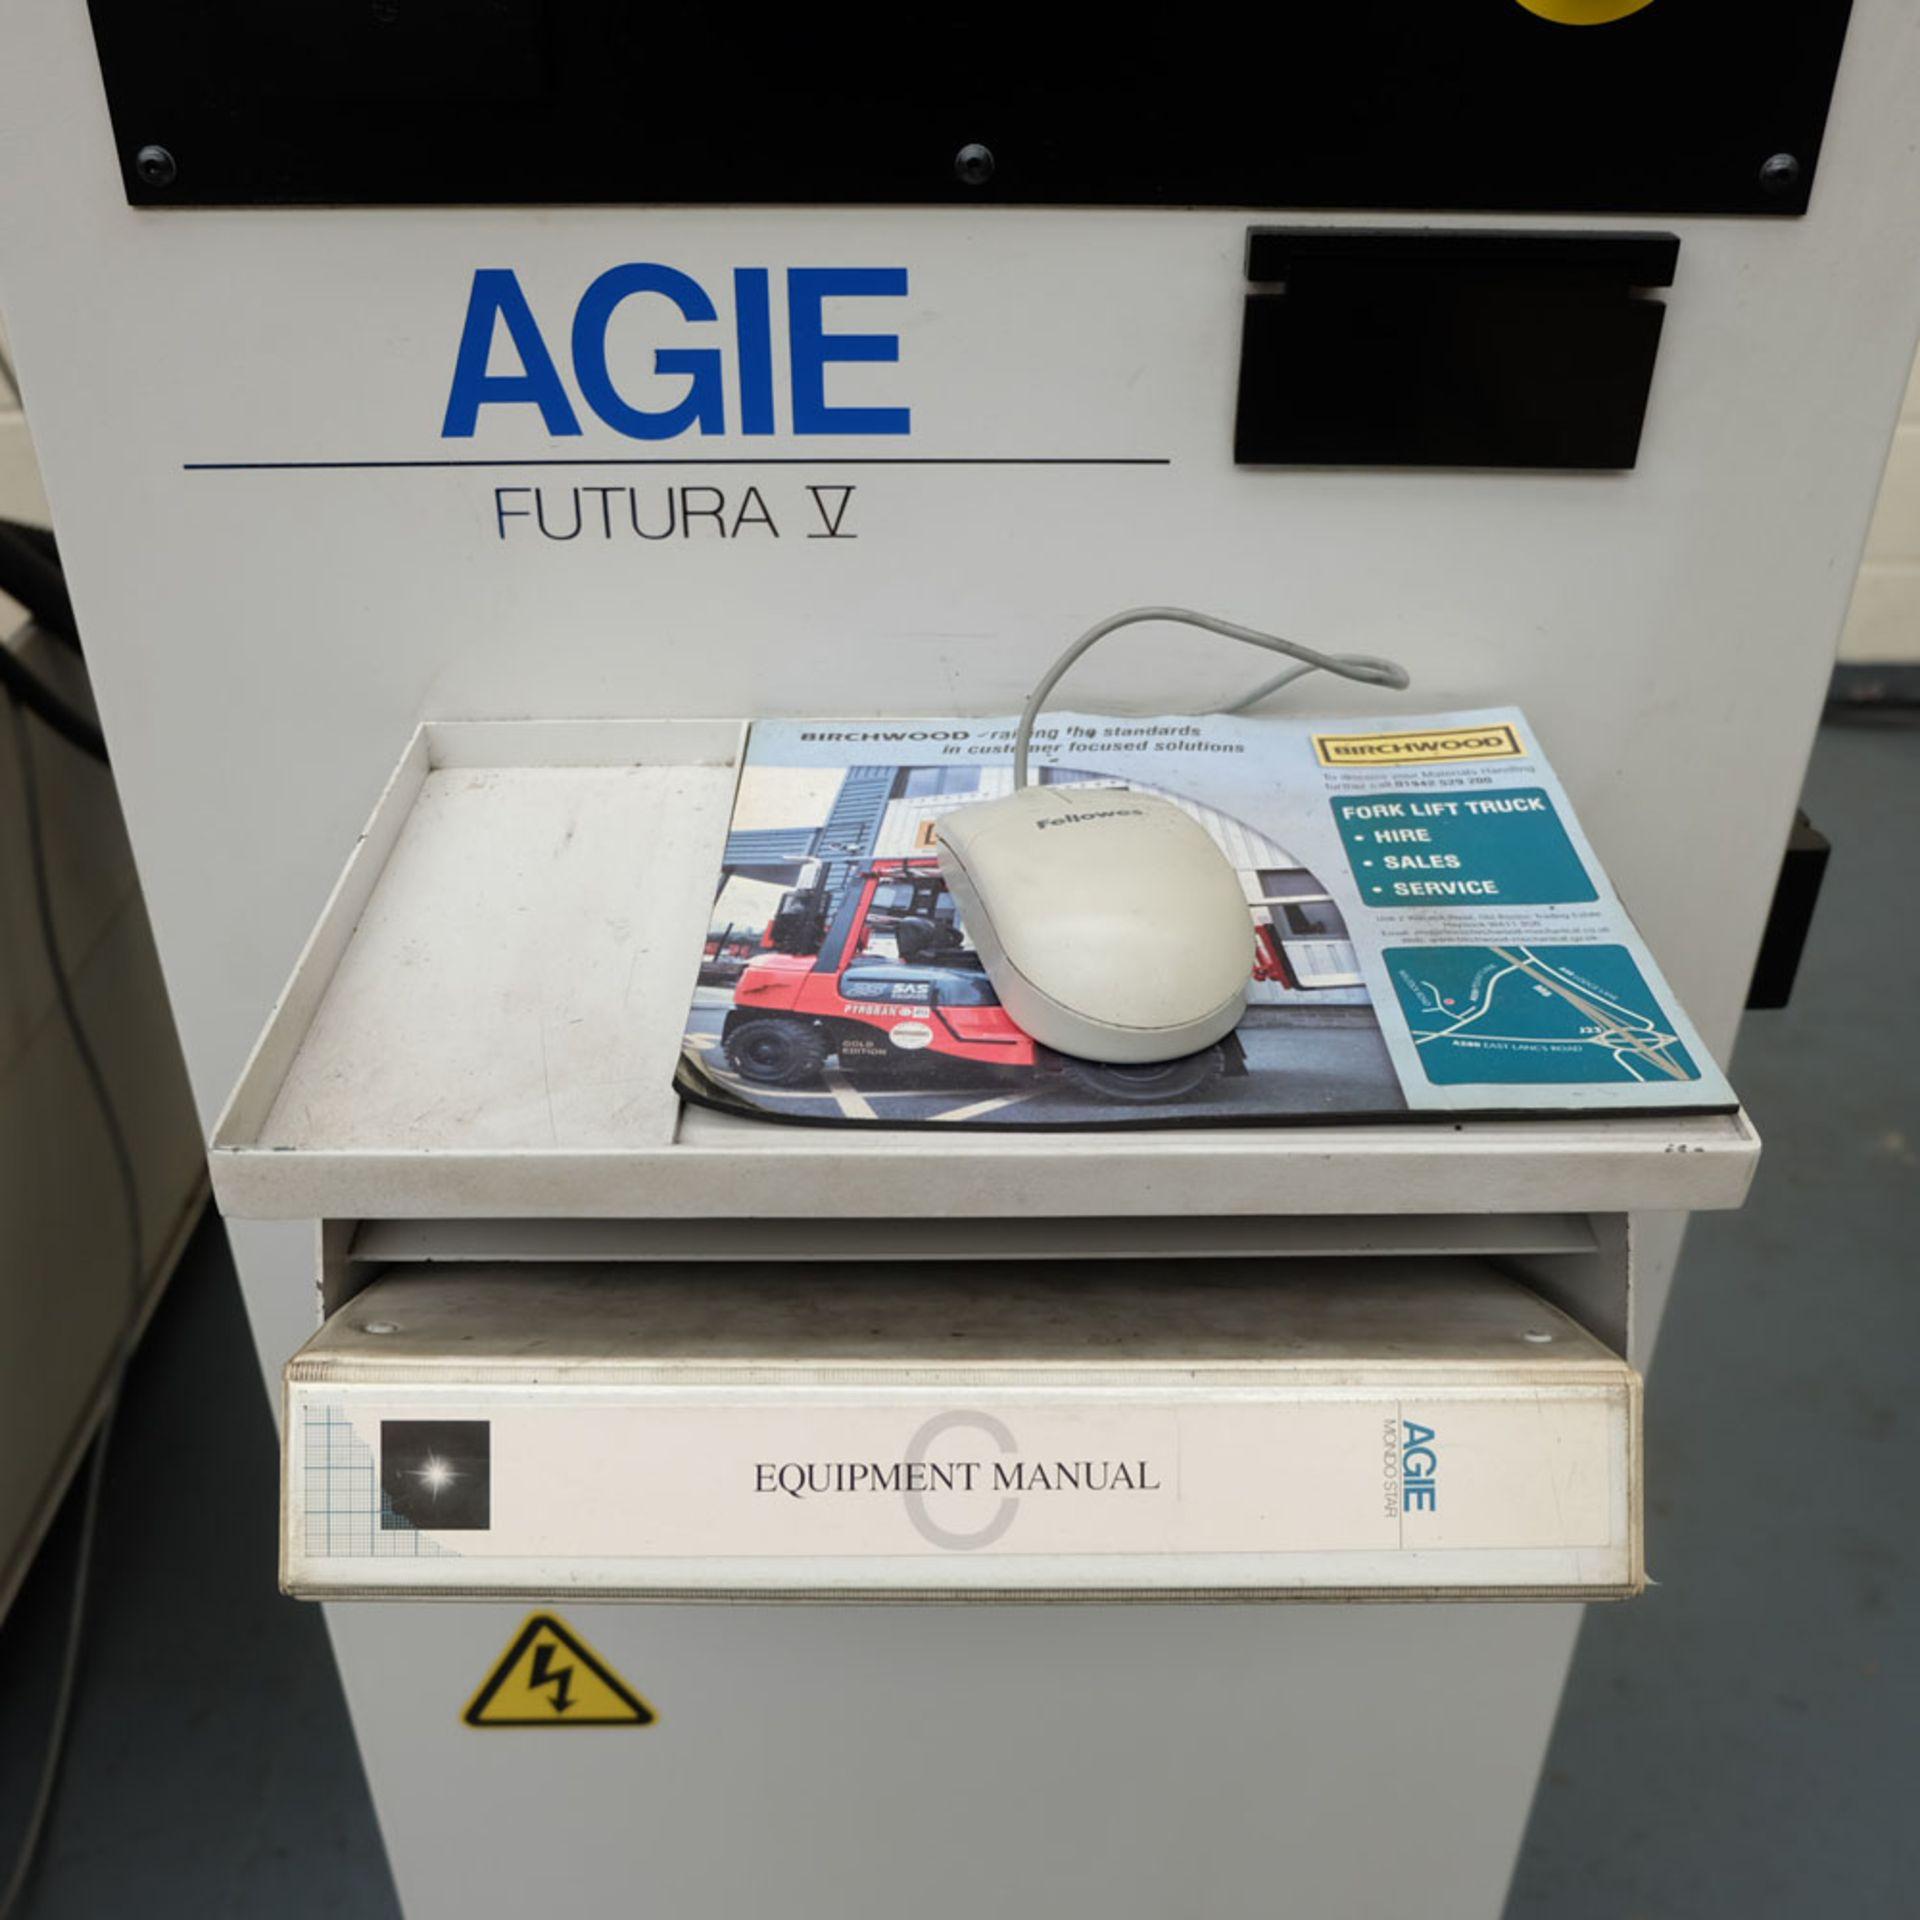 AGIE Mondo Star 20. EDM/Die Sinking Machine With Agie Futura V 1PM Control. - Image 14 of 16